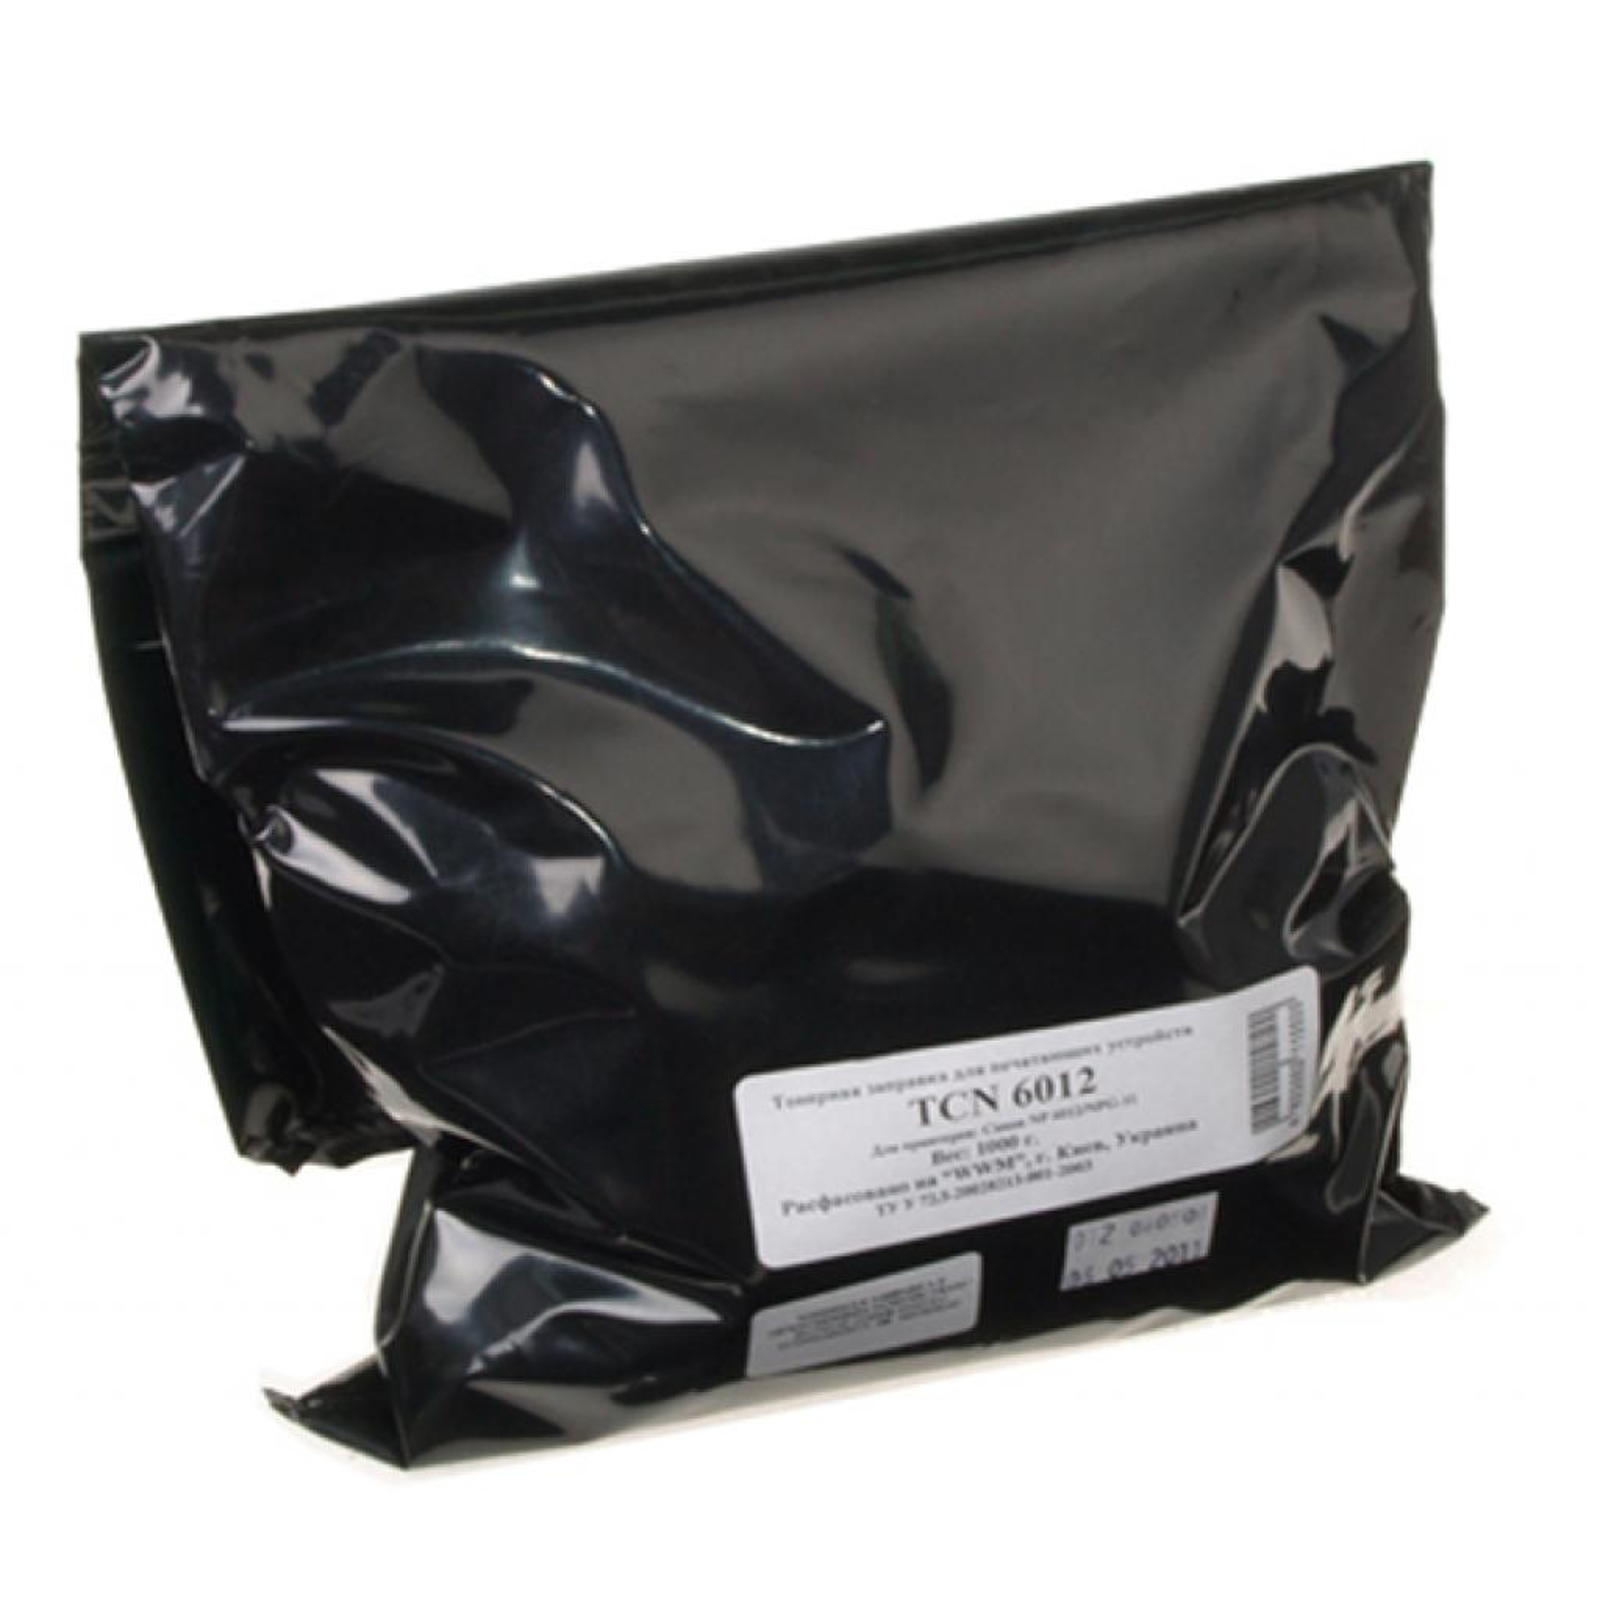 Тонер Canon NP-6012 Black WWM (TH39-4)